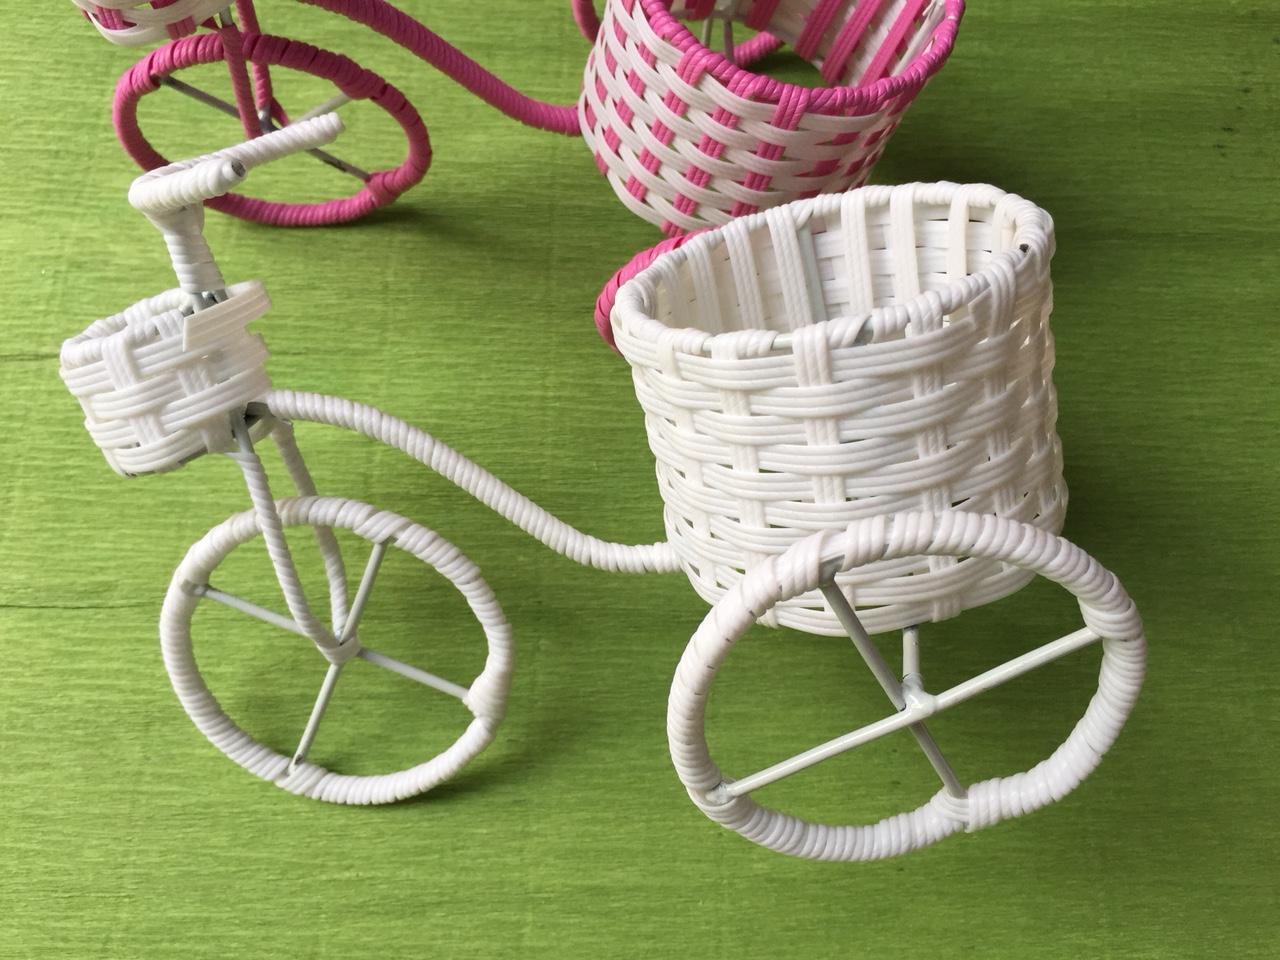 Giỏ hoa xe đạp – giỏ cắm hoa xe đạp